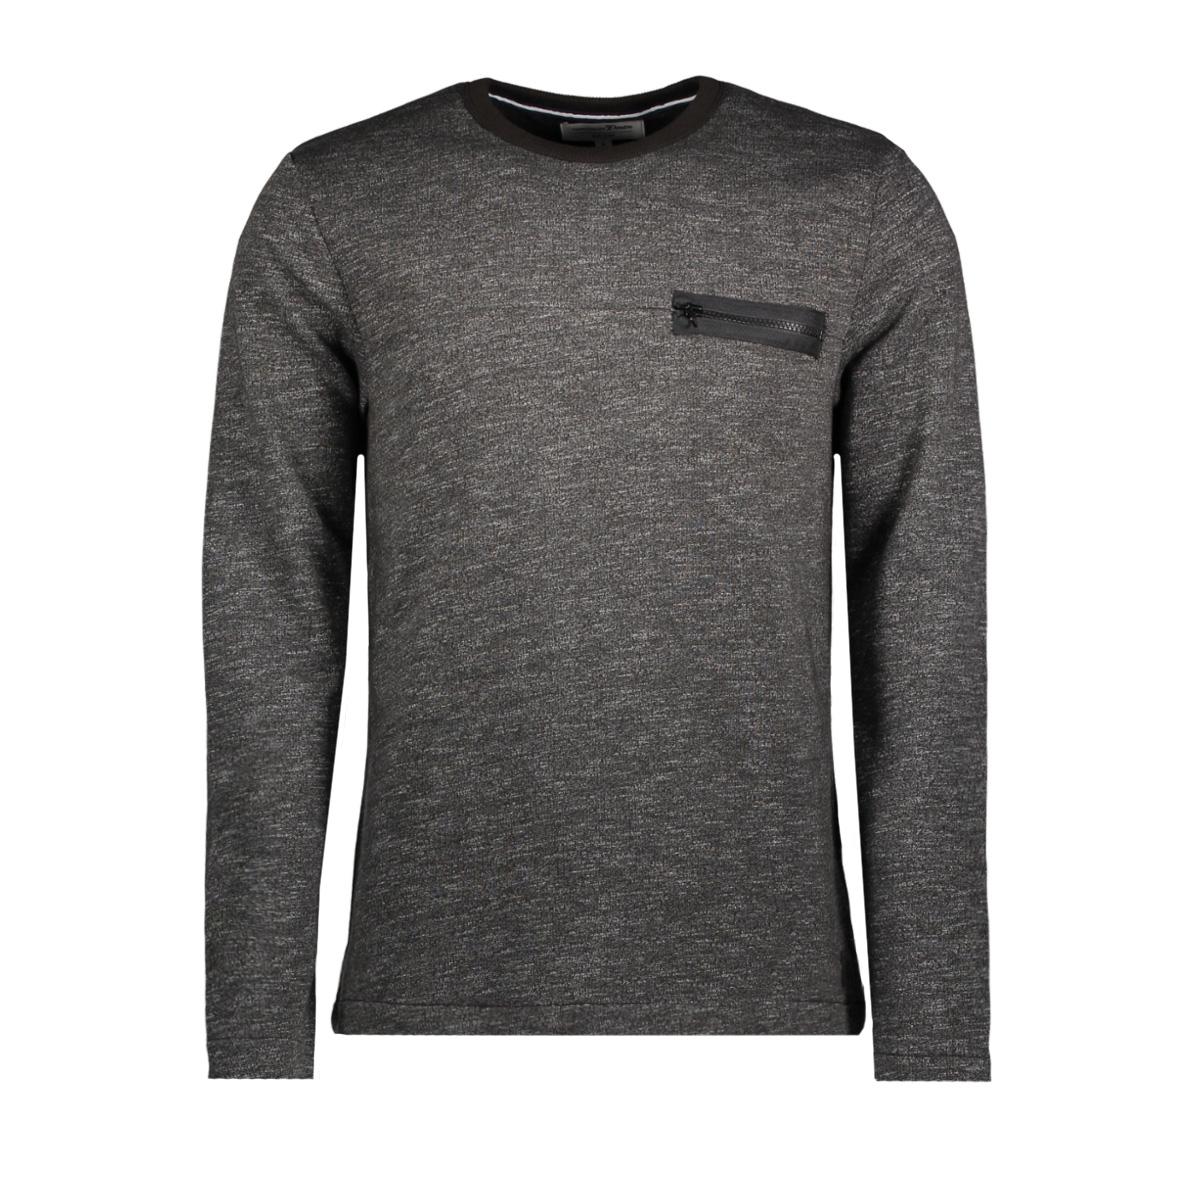 2555107.00.12 tom tailor sweater 2752